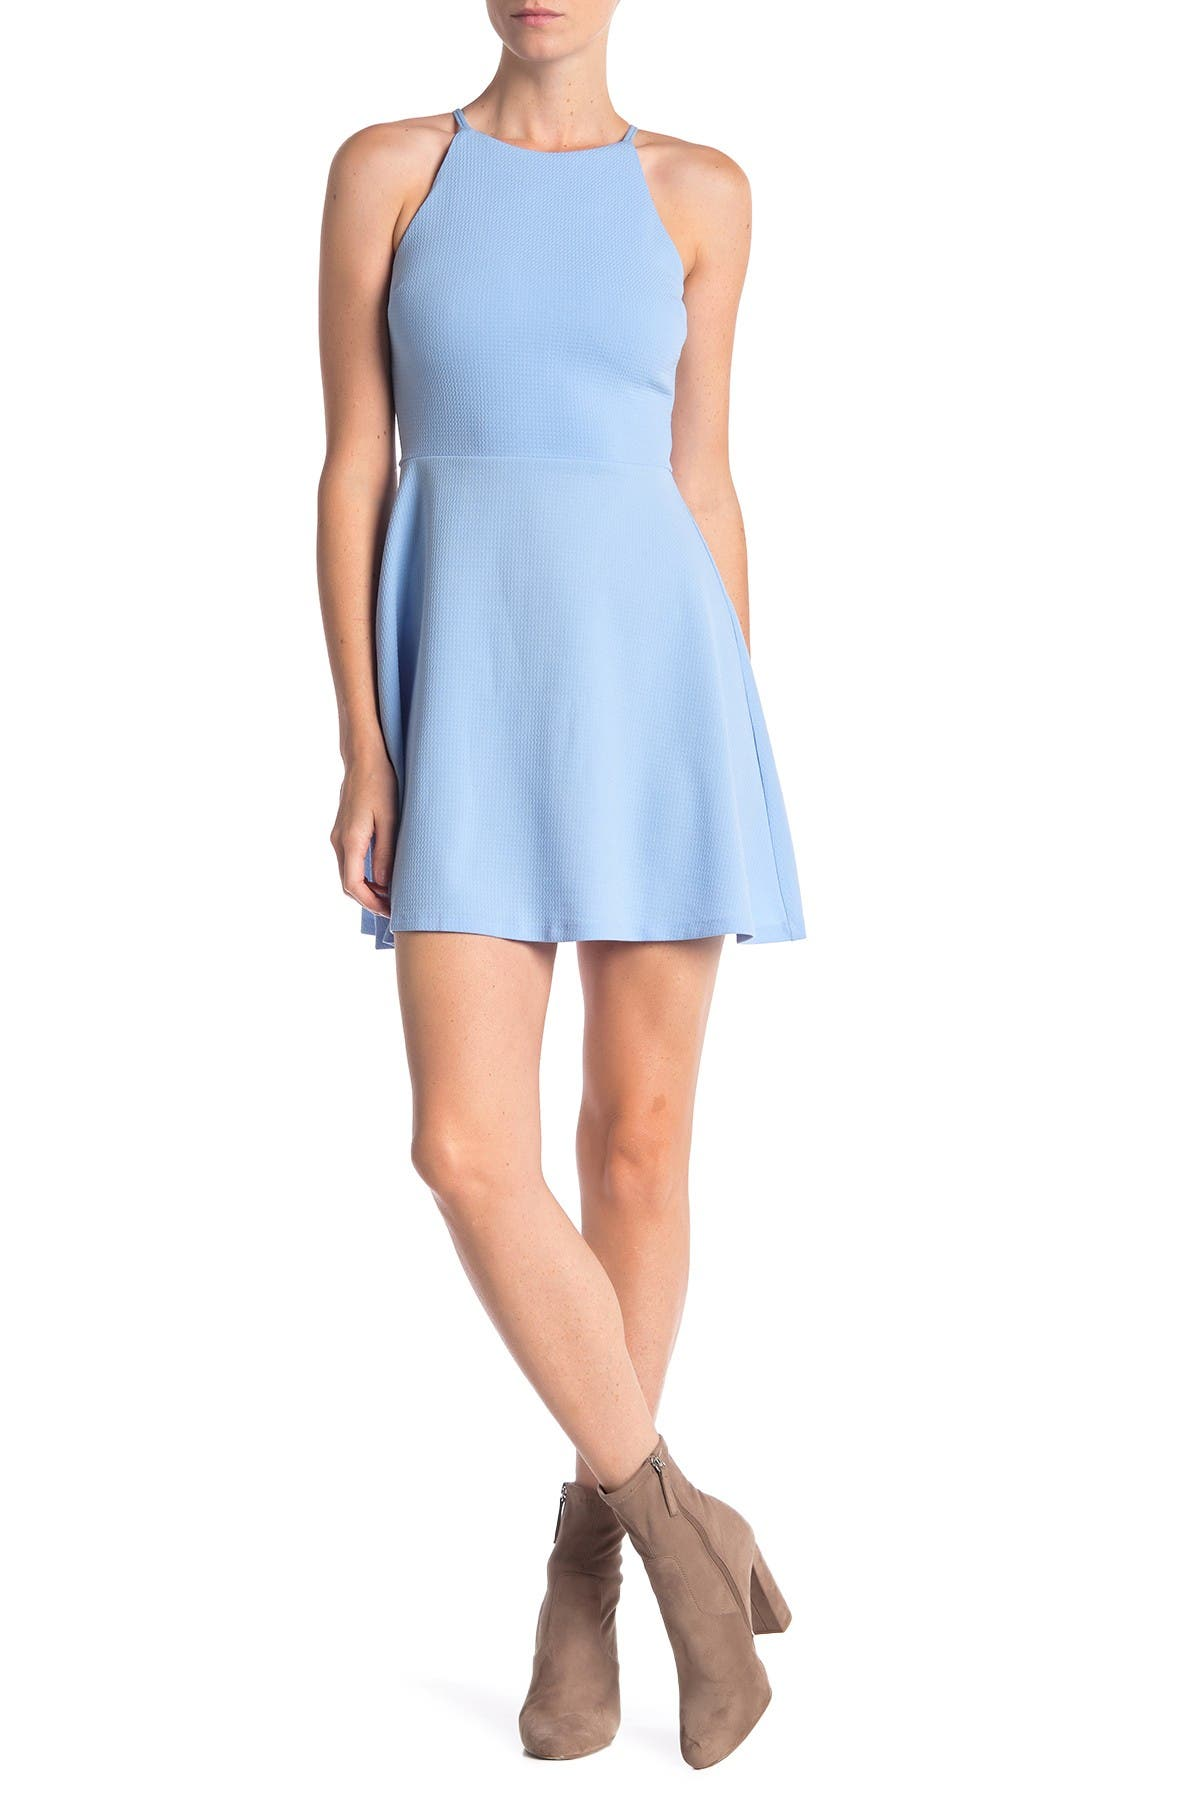 Image of Love...Ady Textured Skater Dress